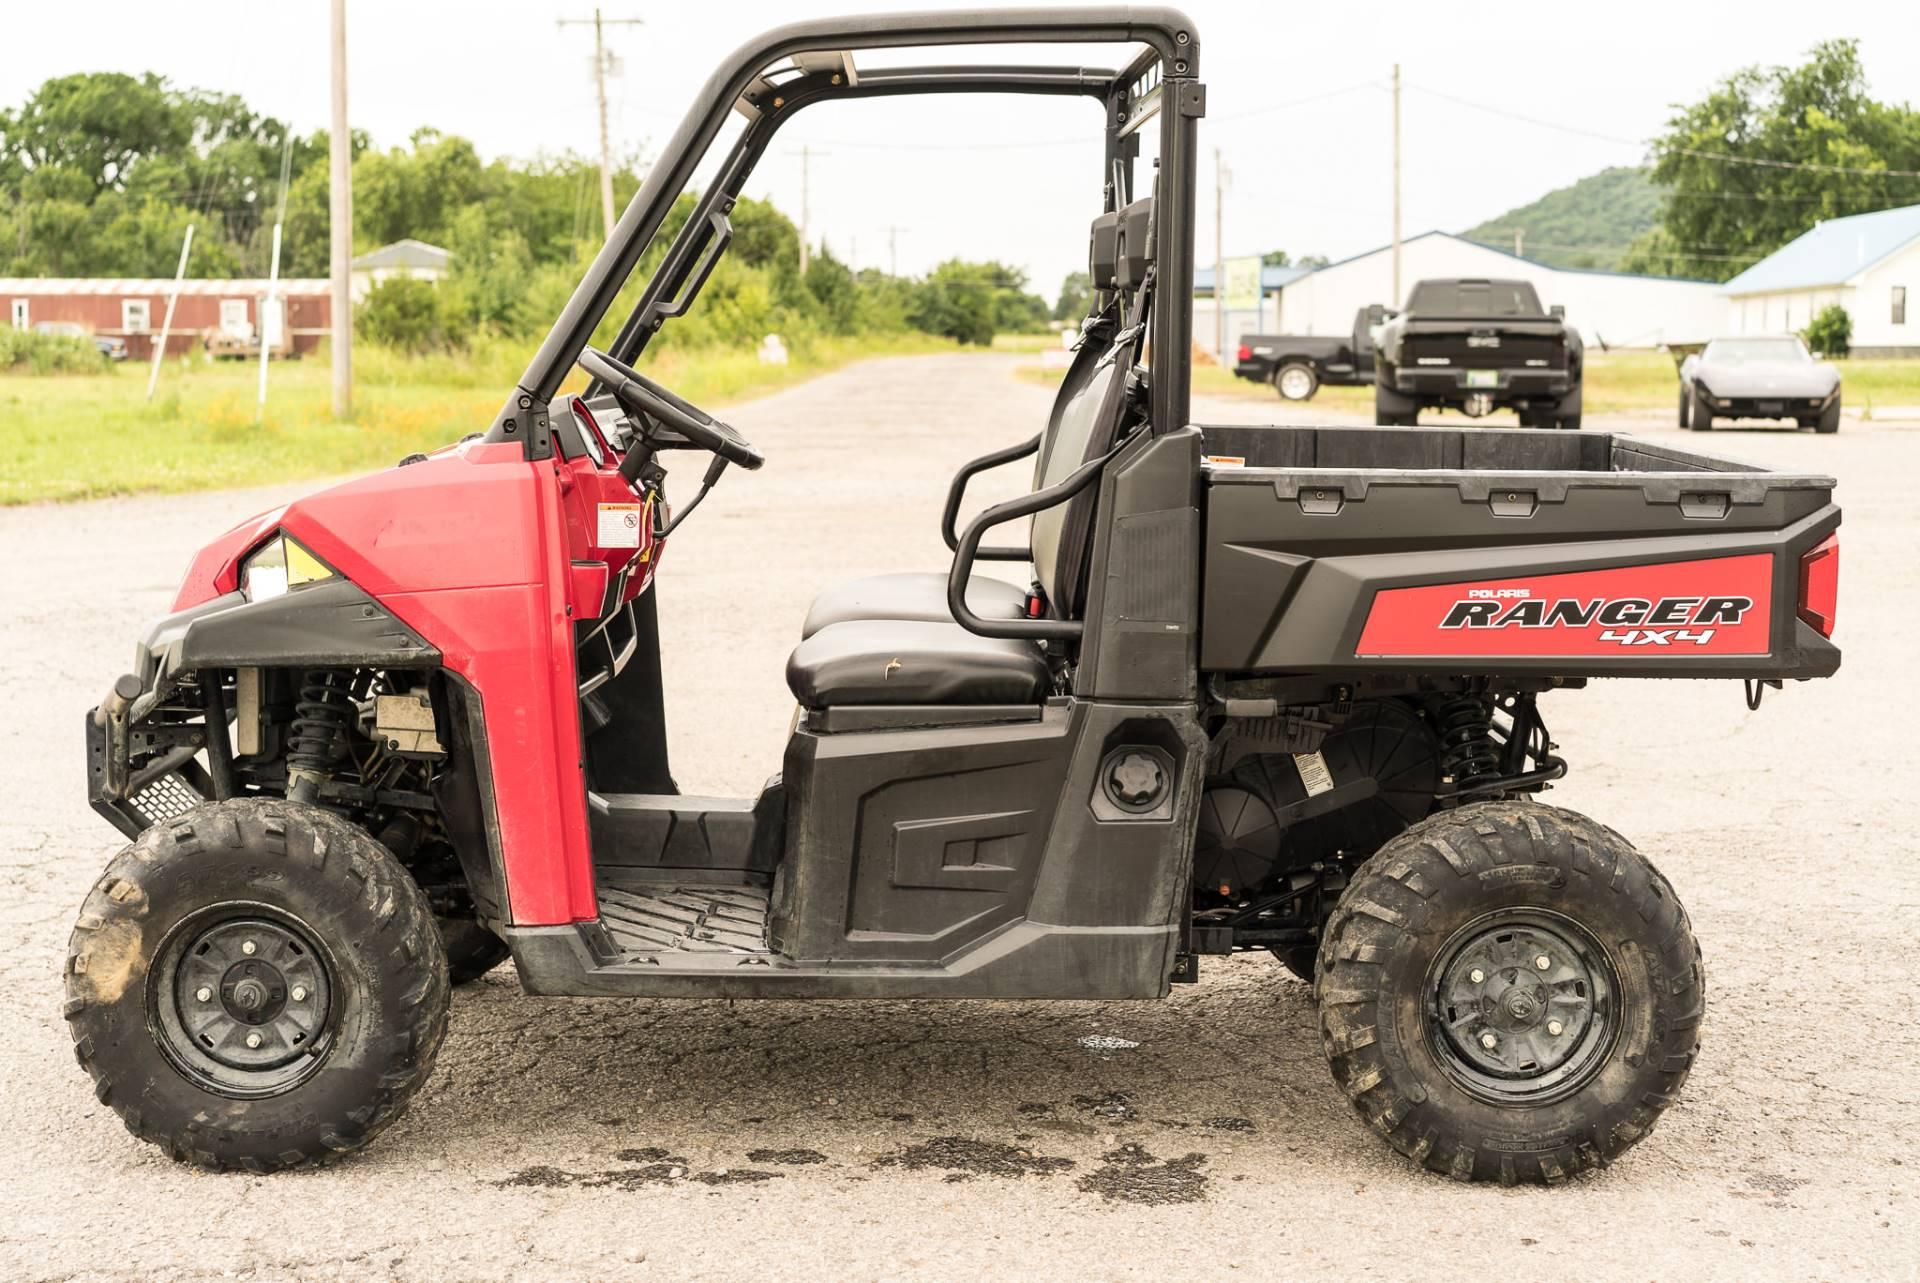 2015 Polaris Ranger570 Full Size 4